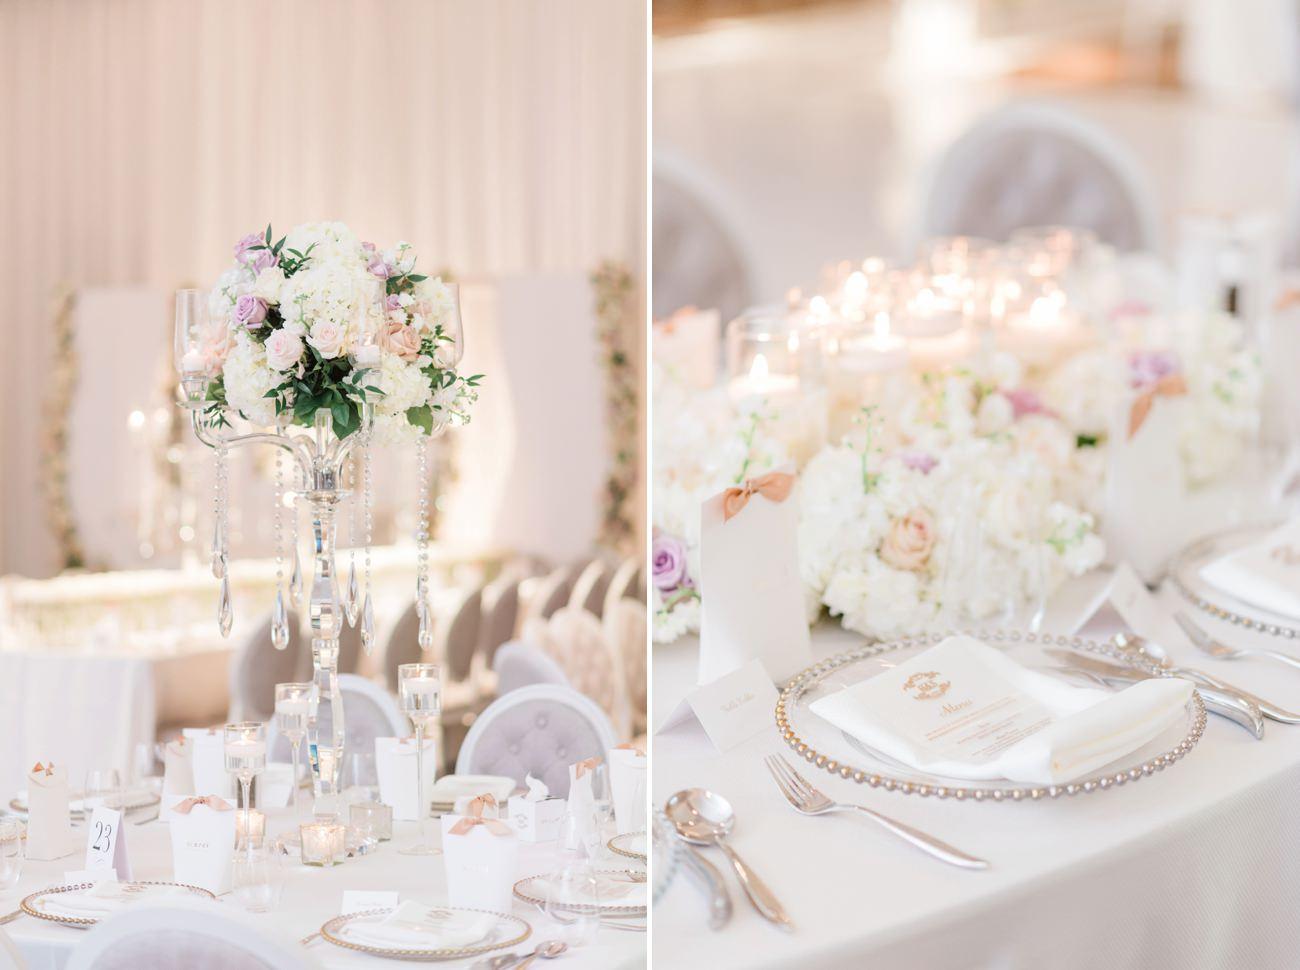 arlington-estate-winter-wedding-reception-details-2.jpg